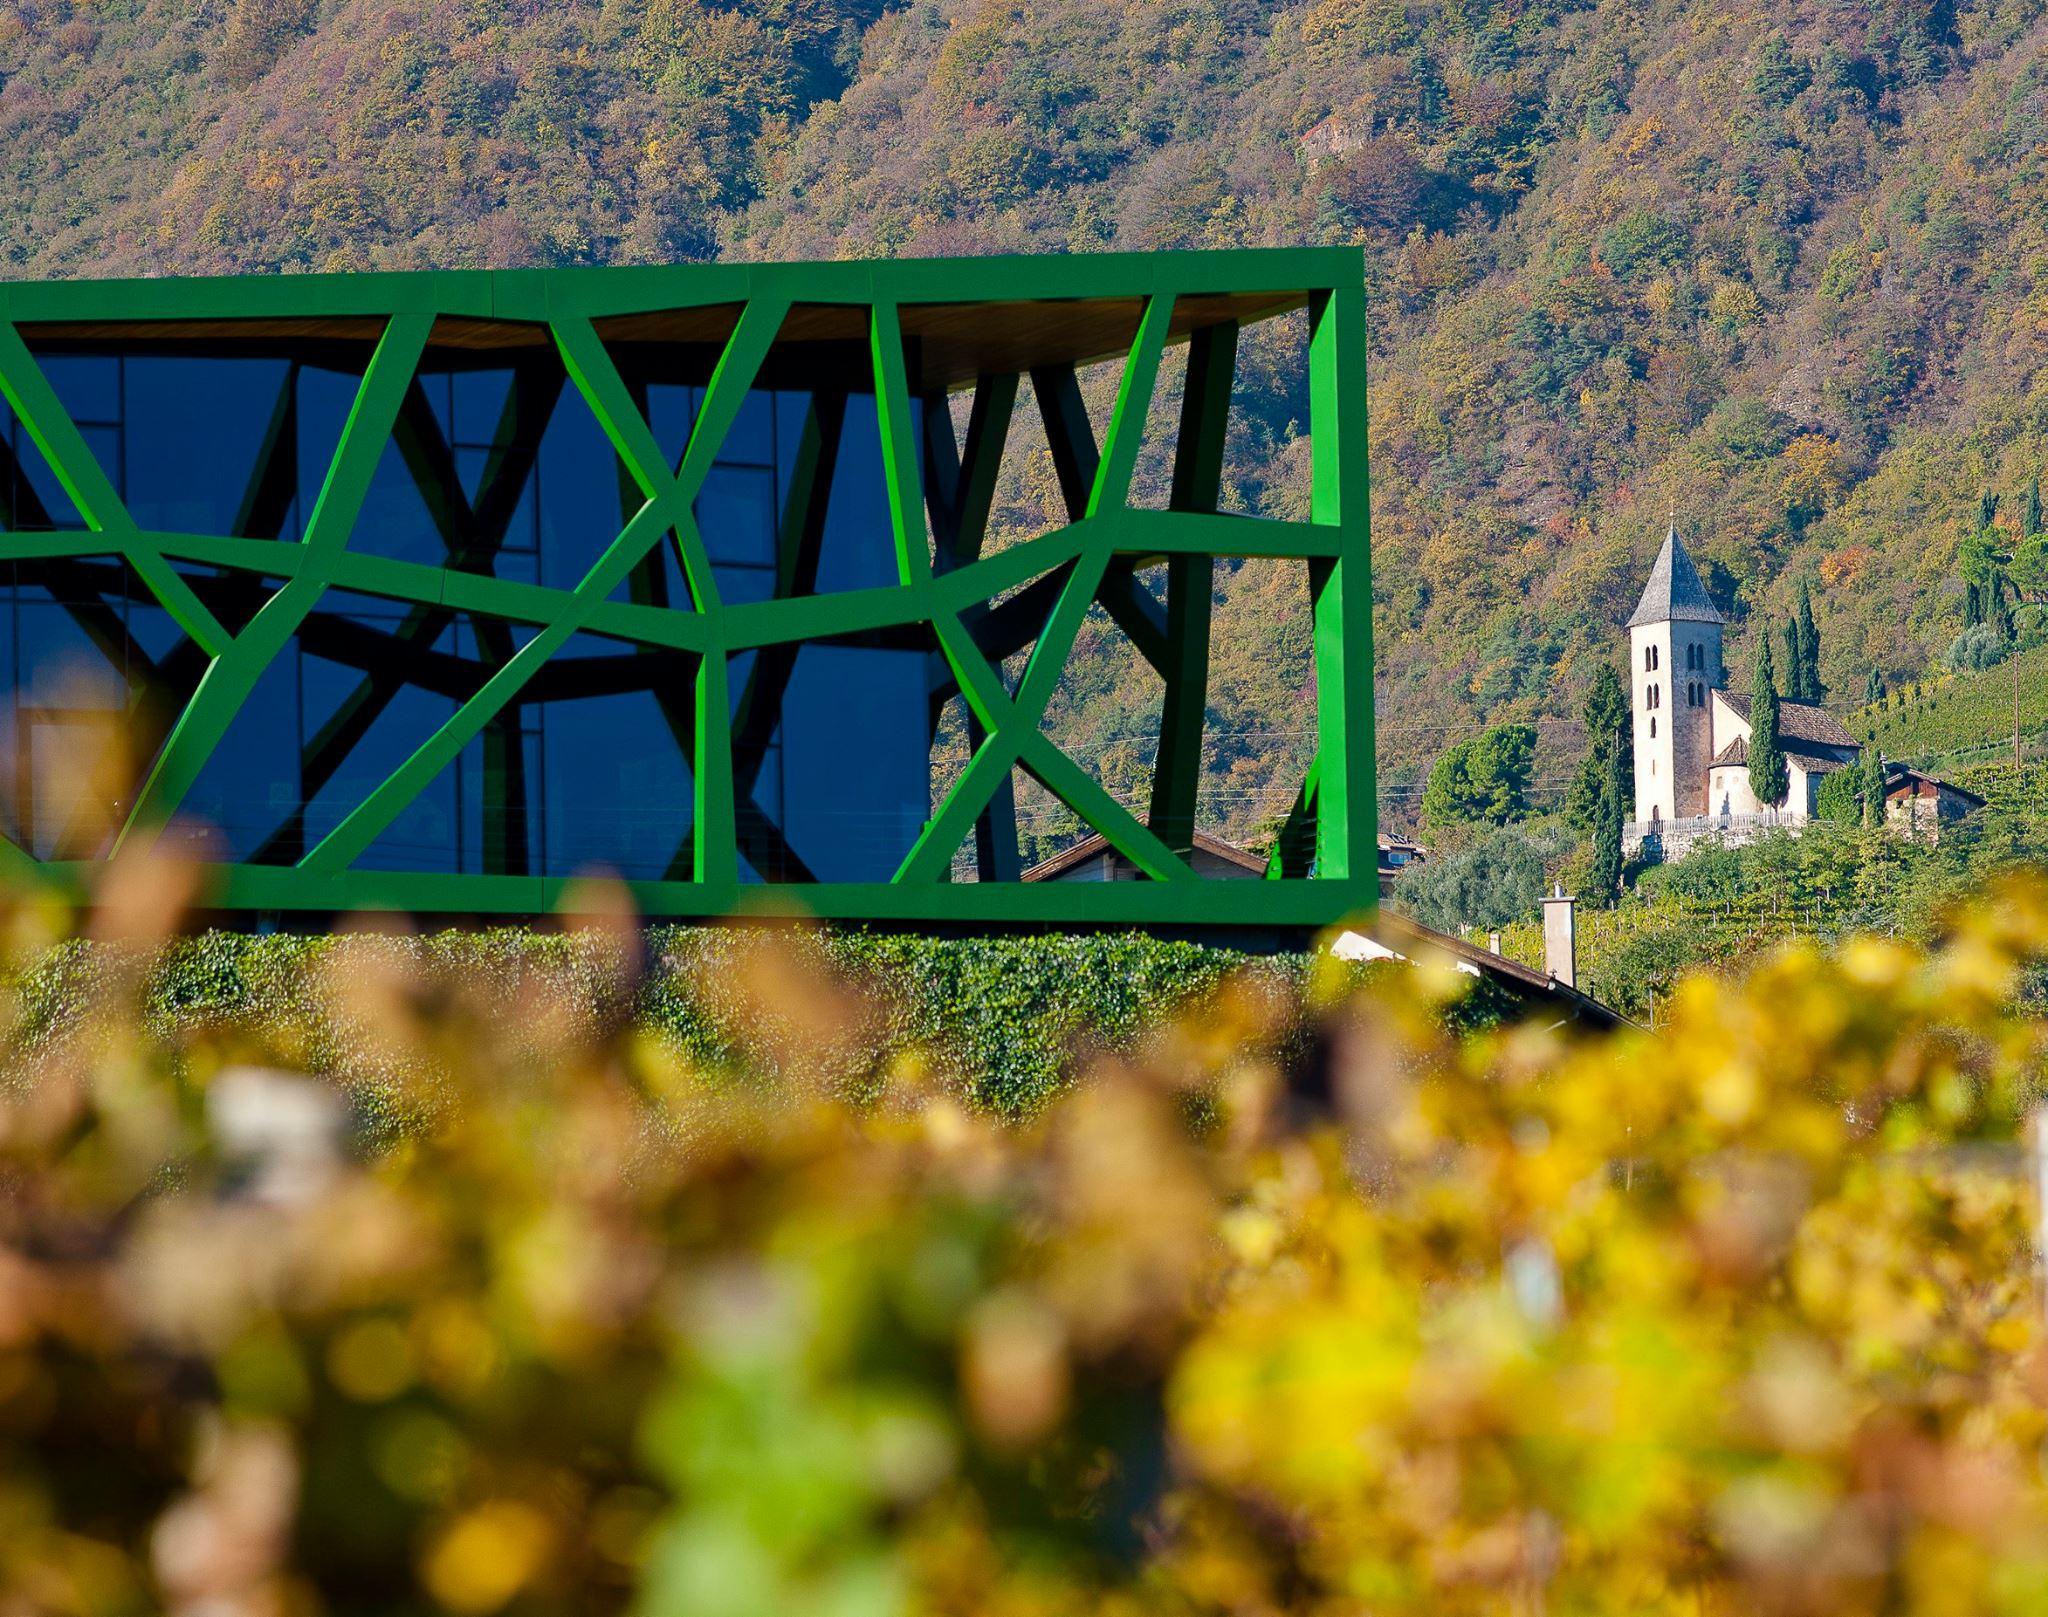 Tramin vineyards and winery